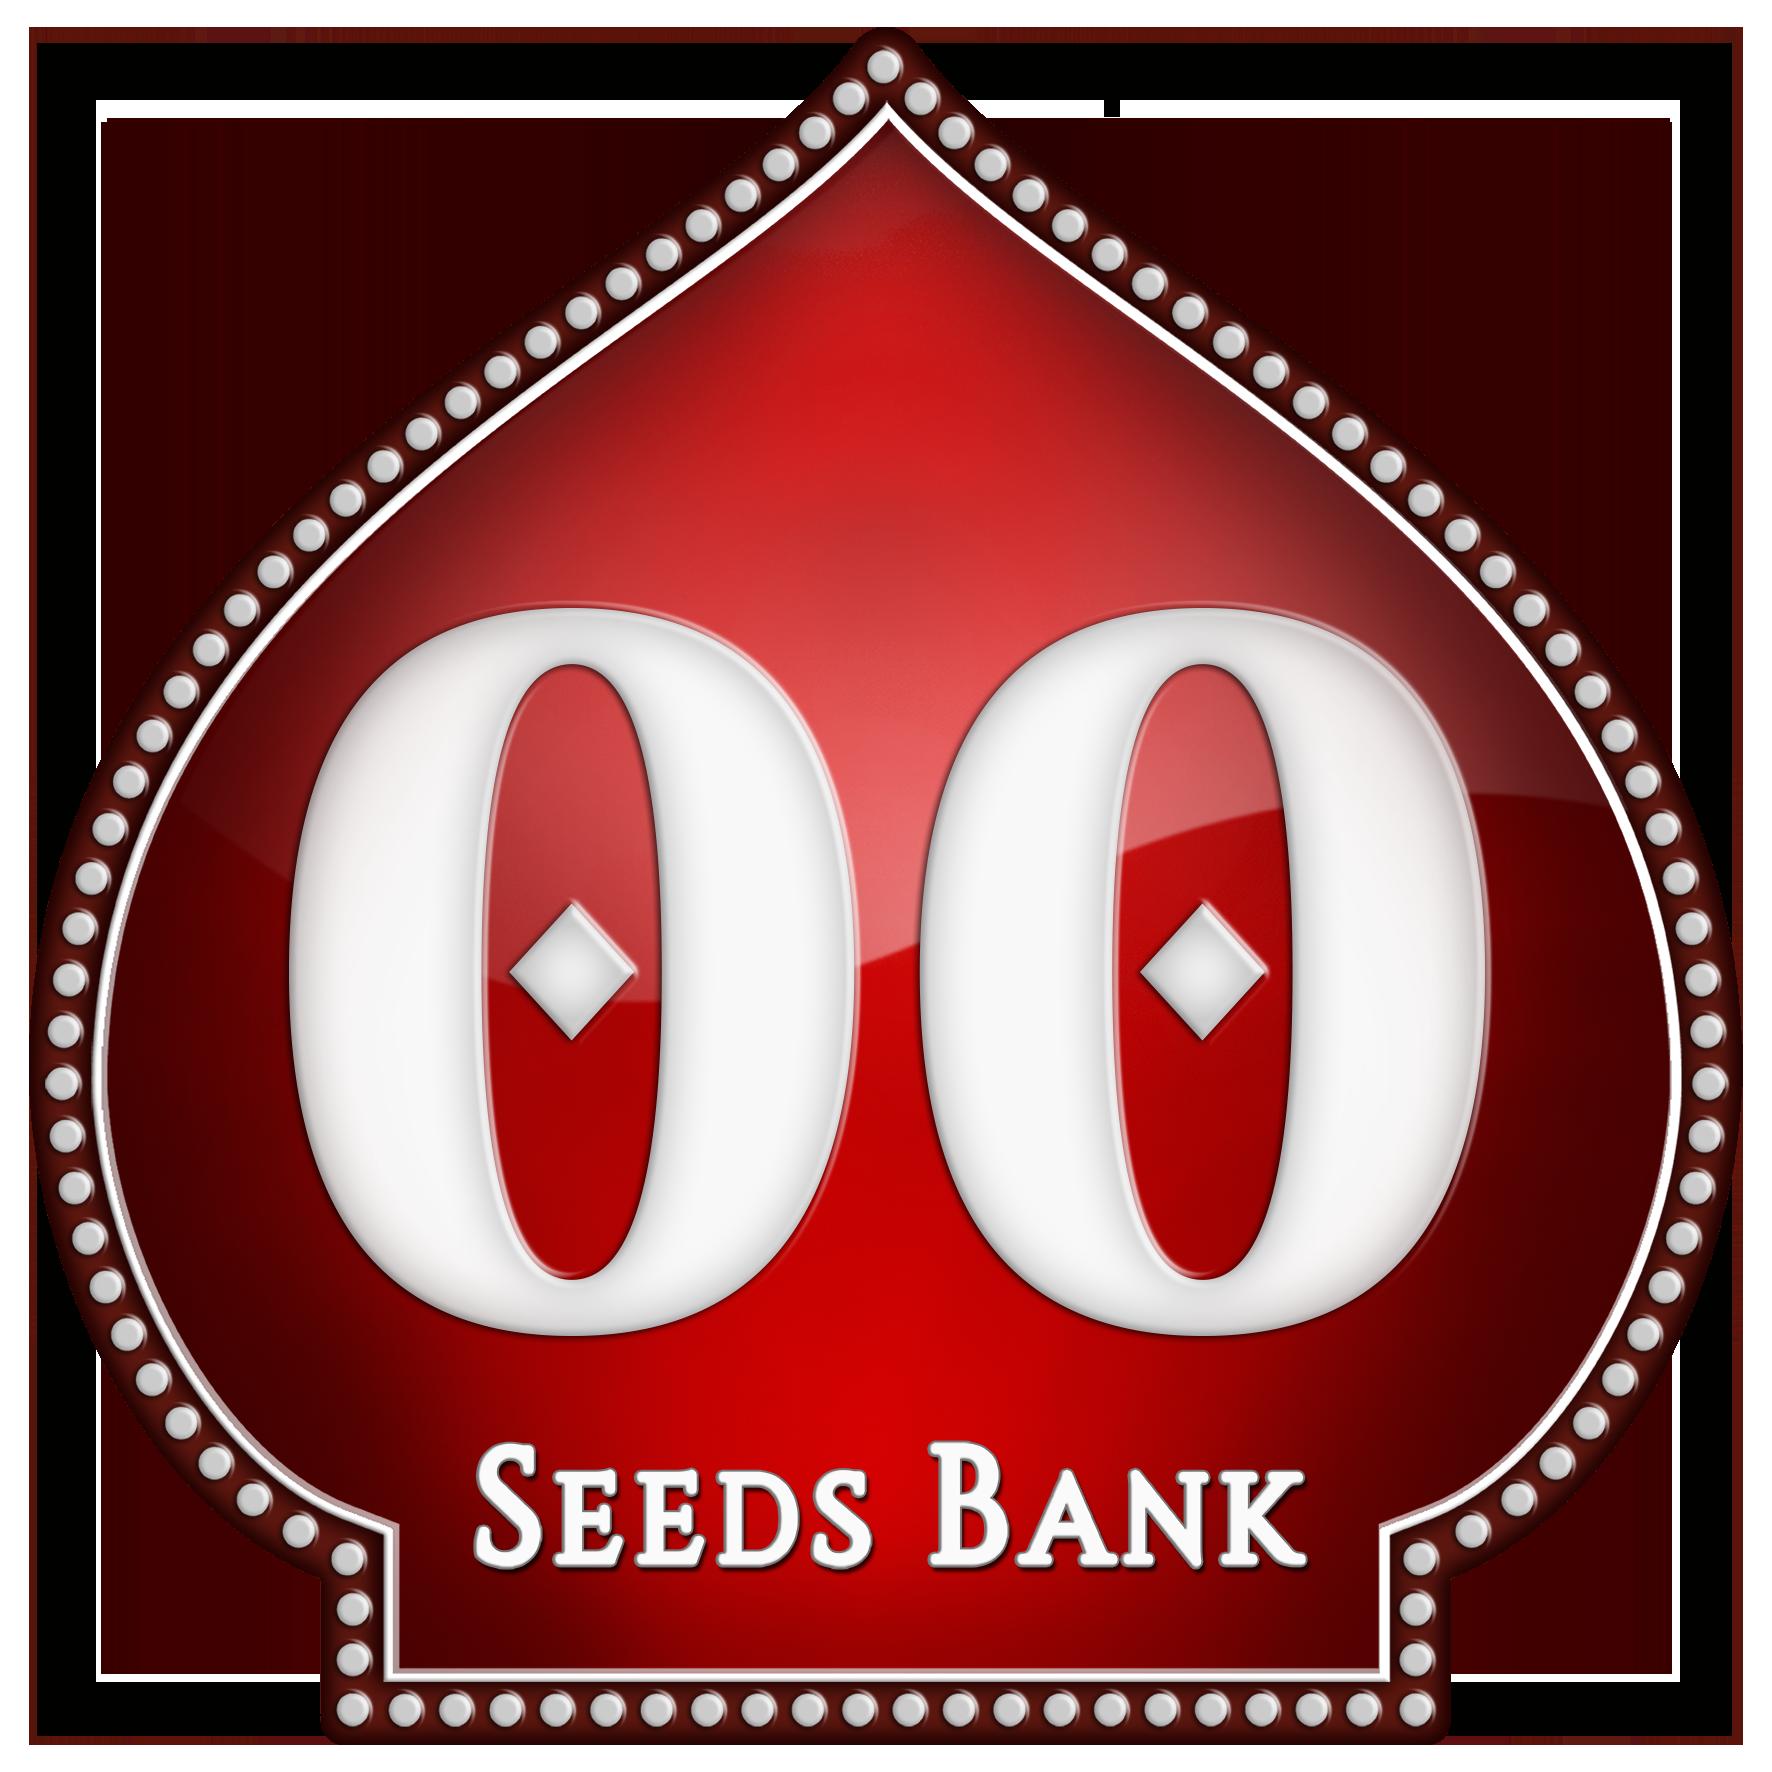 logo 00 seeds bank.png